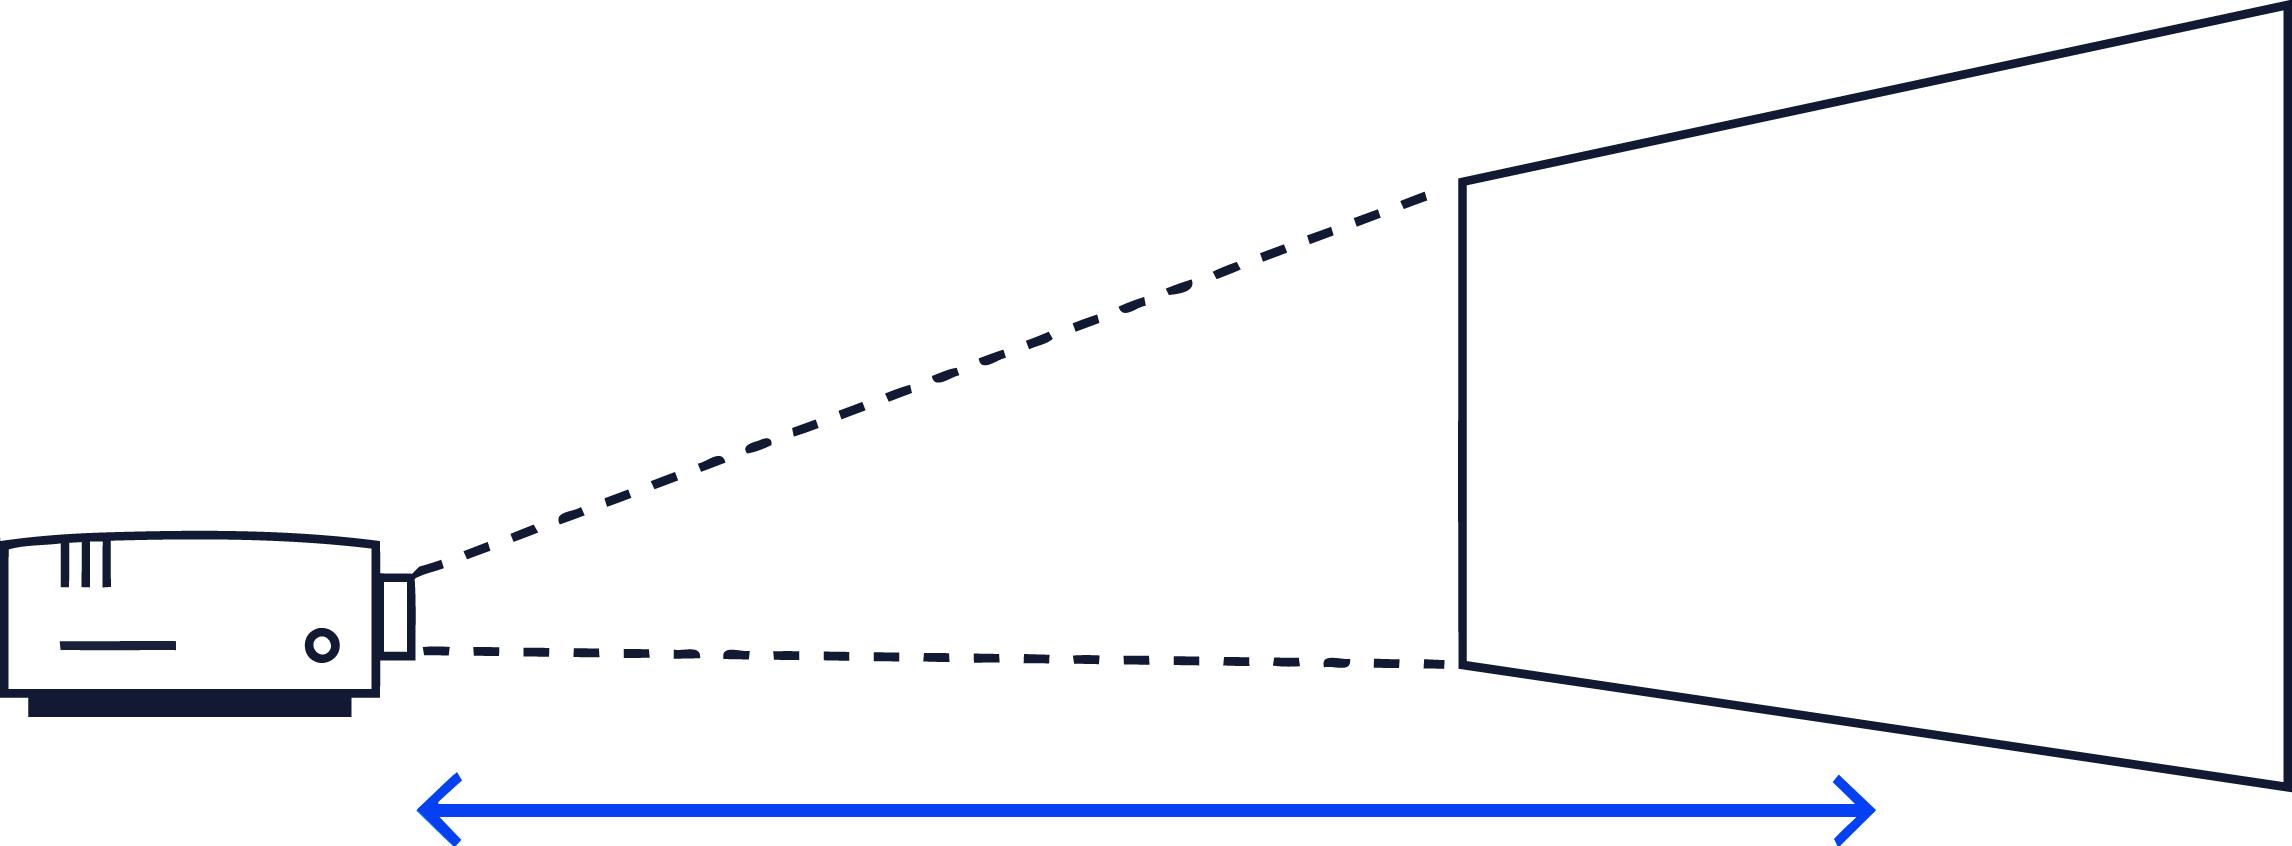 projektionsfl chenberechner abstand bildgr e berechnen. Black Bedroom Furniture Sets. Home Design Ideas